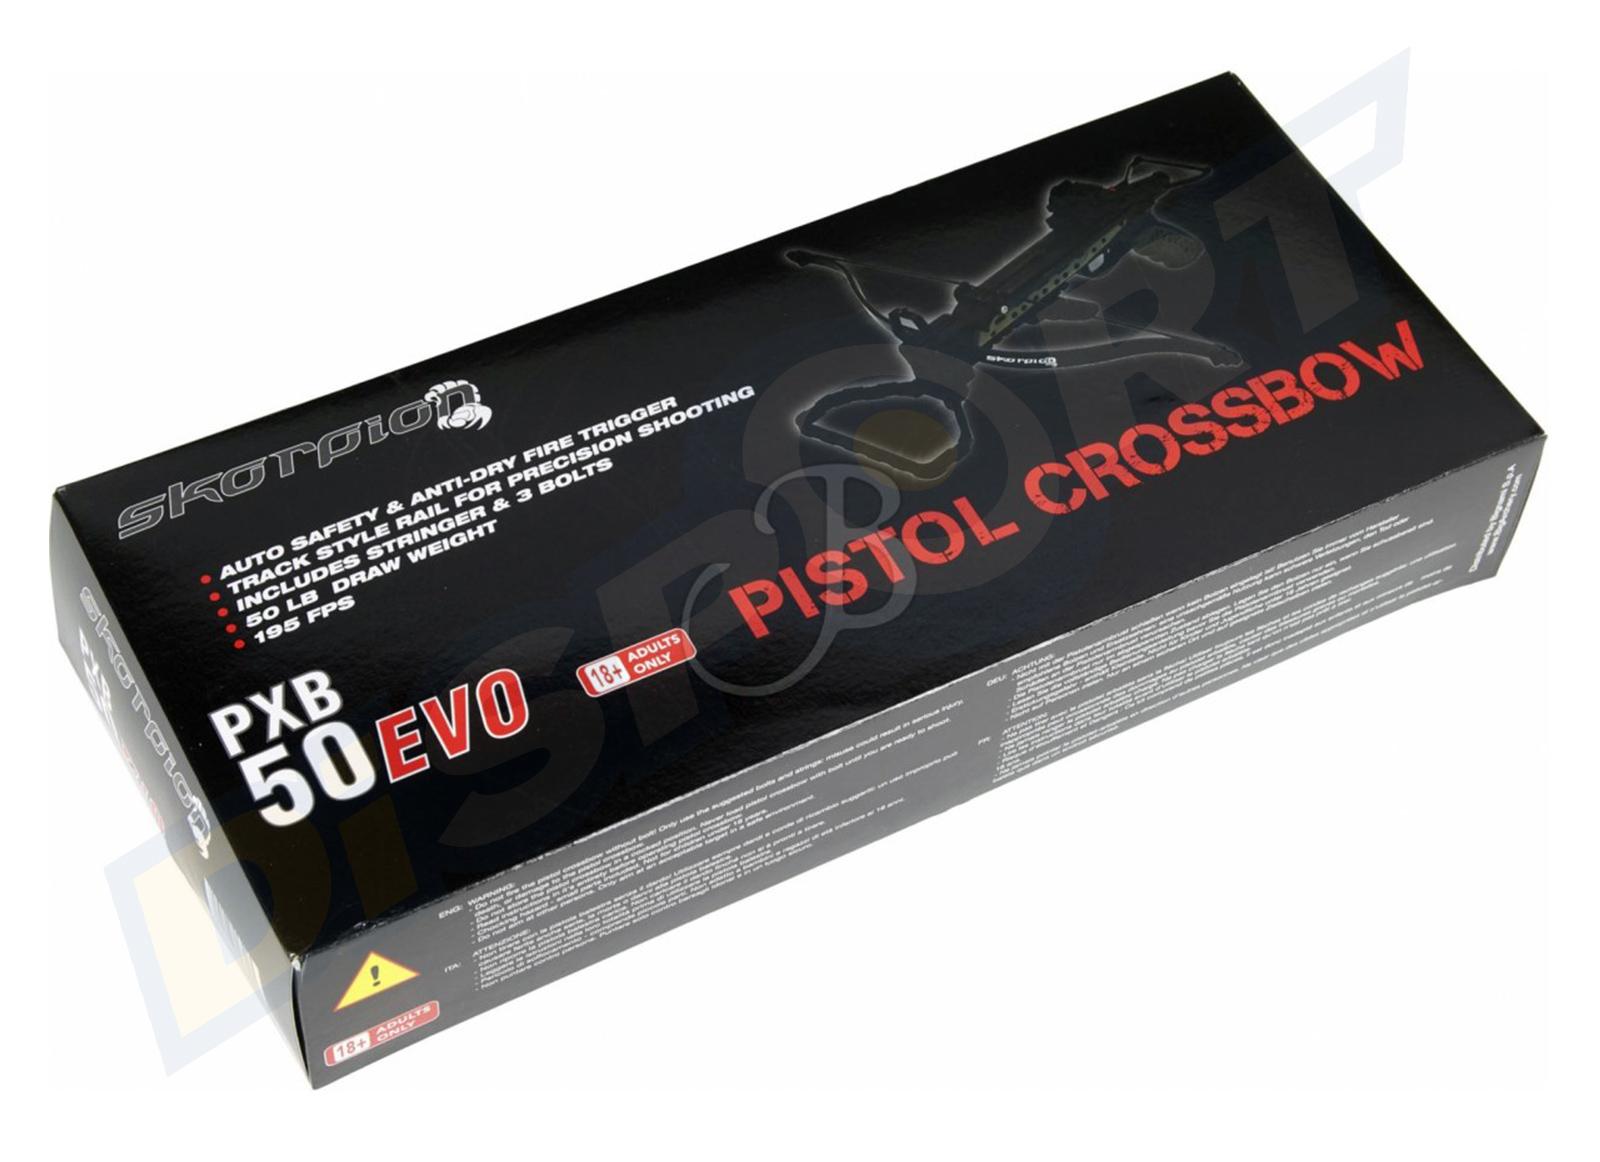 SKORPION PISTOLA BALESTRA PXB50 EVO PACKGAGE COMPLETO